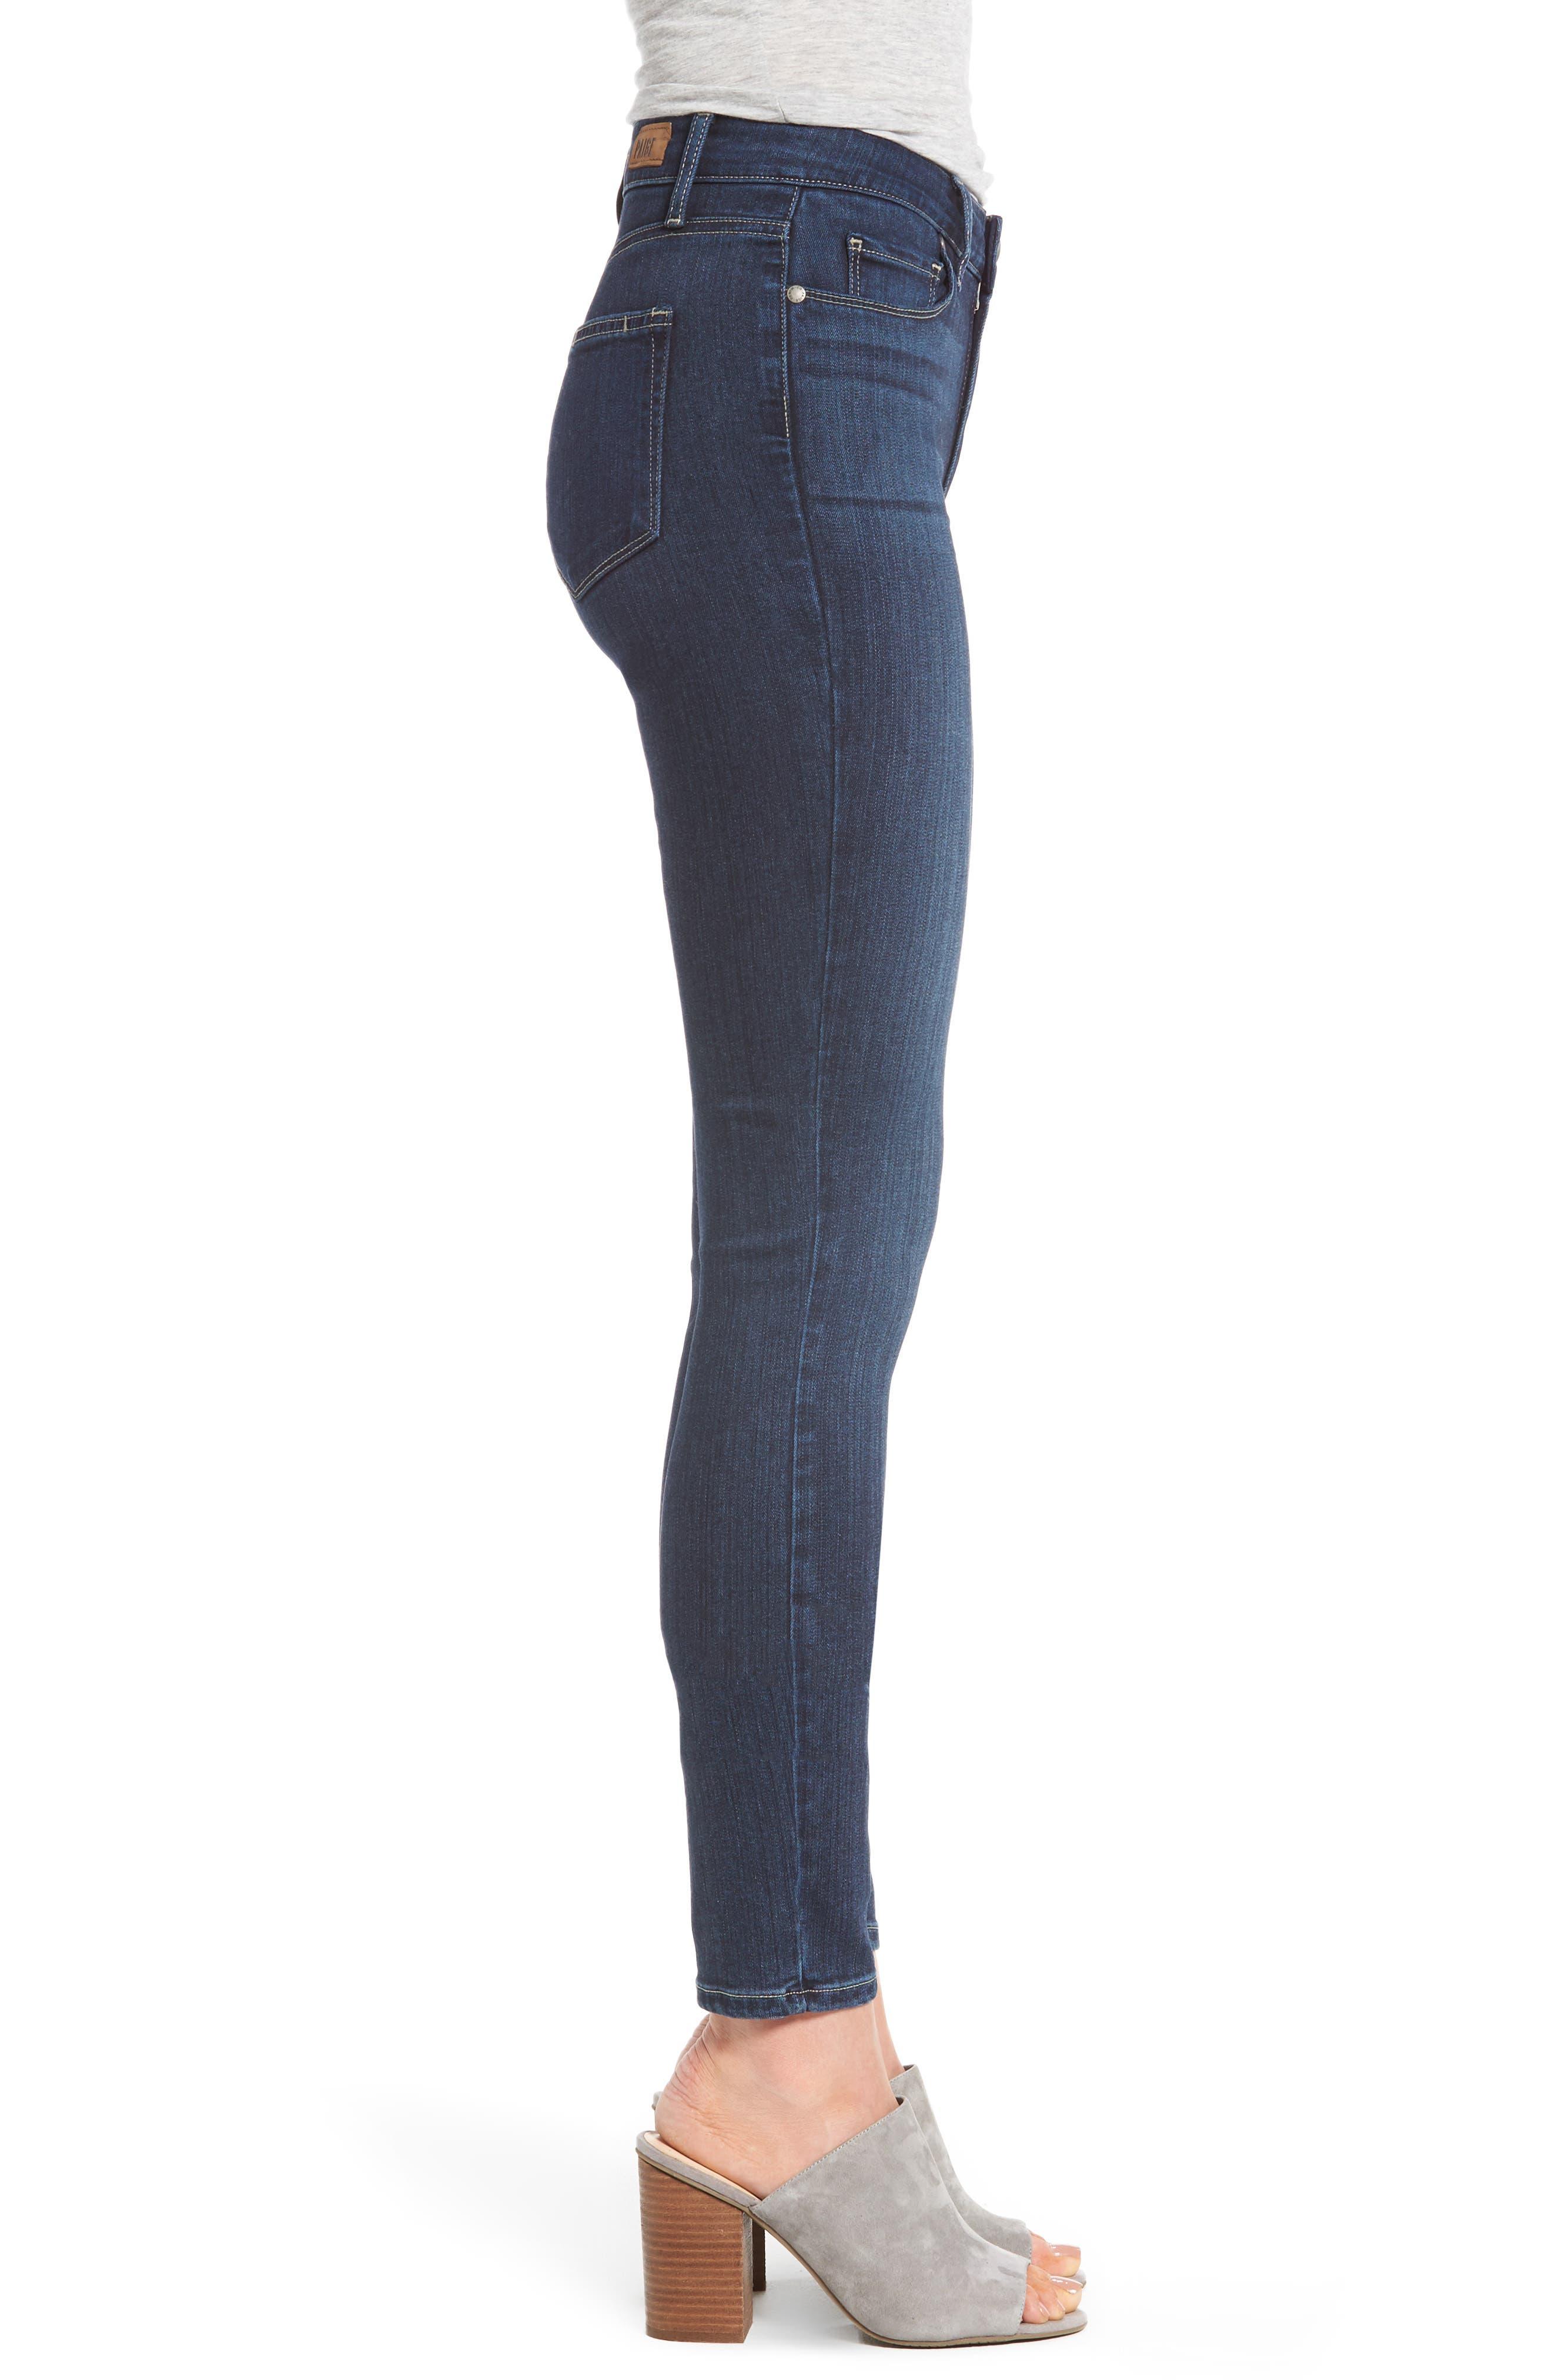 Transcend - Hoxton High Waist Ankle Skinny Jeans,                             Alternate thumbnail 3, color,                             400